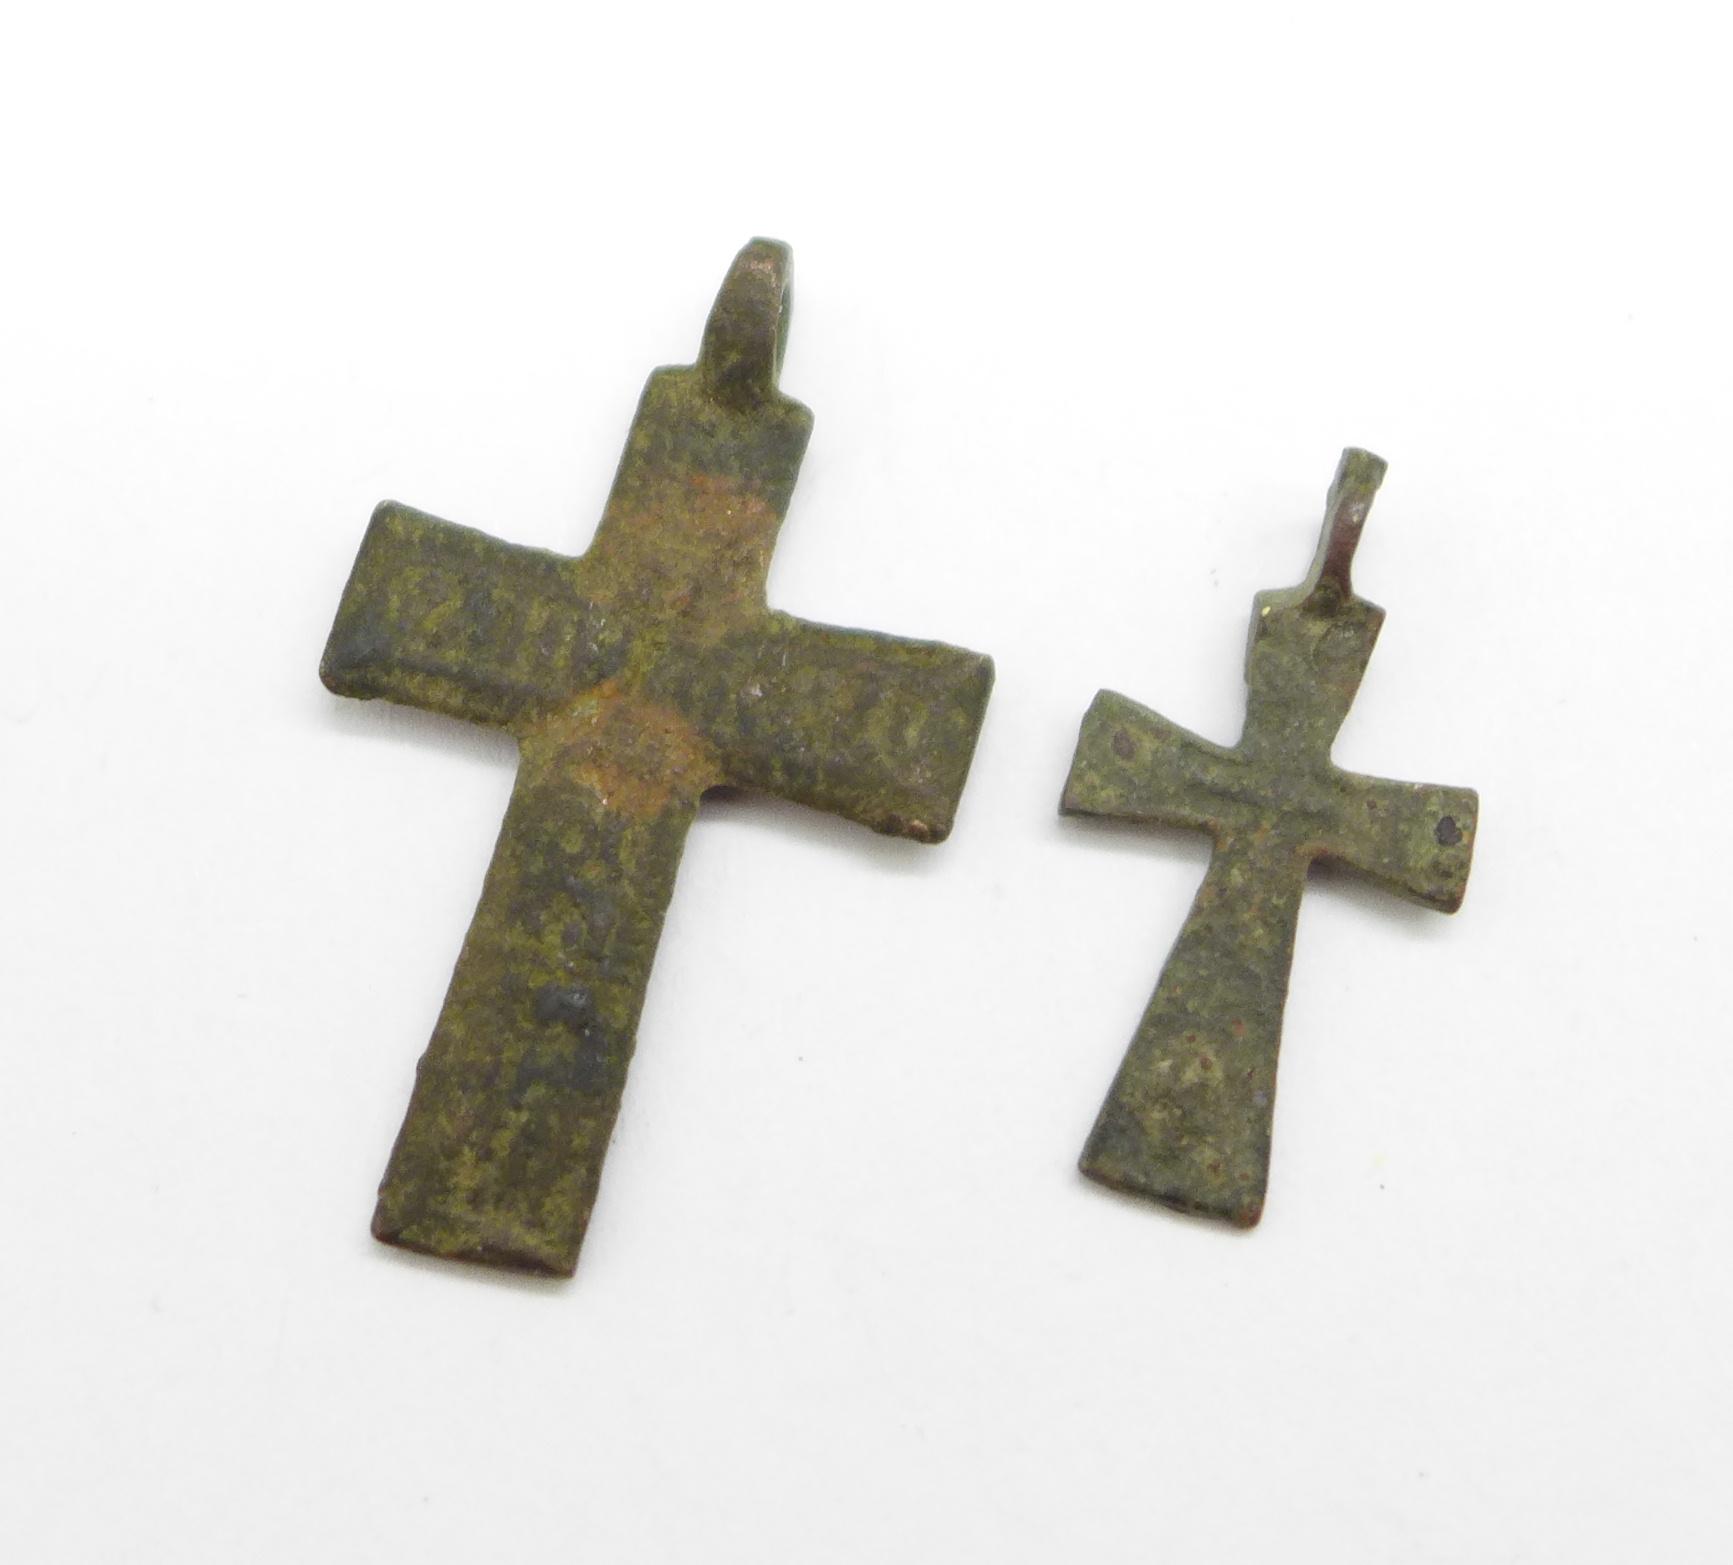 Two bronze Viking crosses, found in Russia